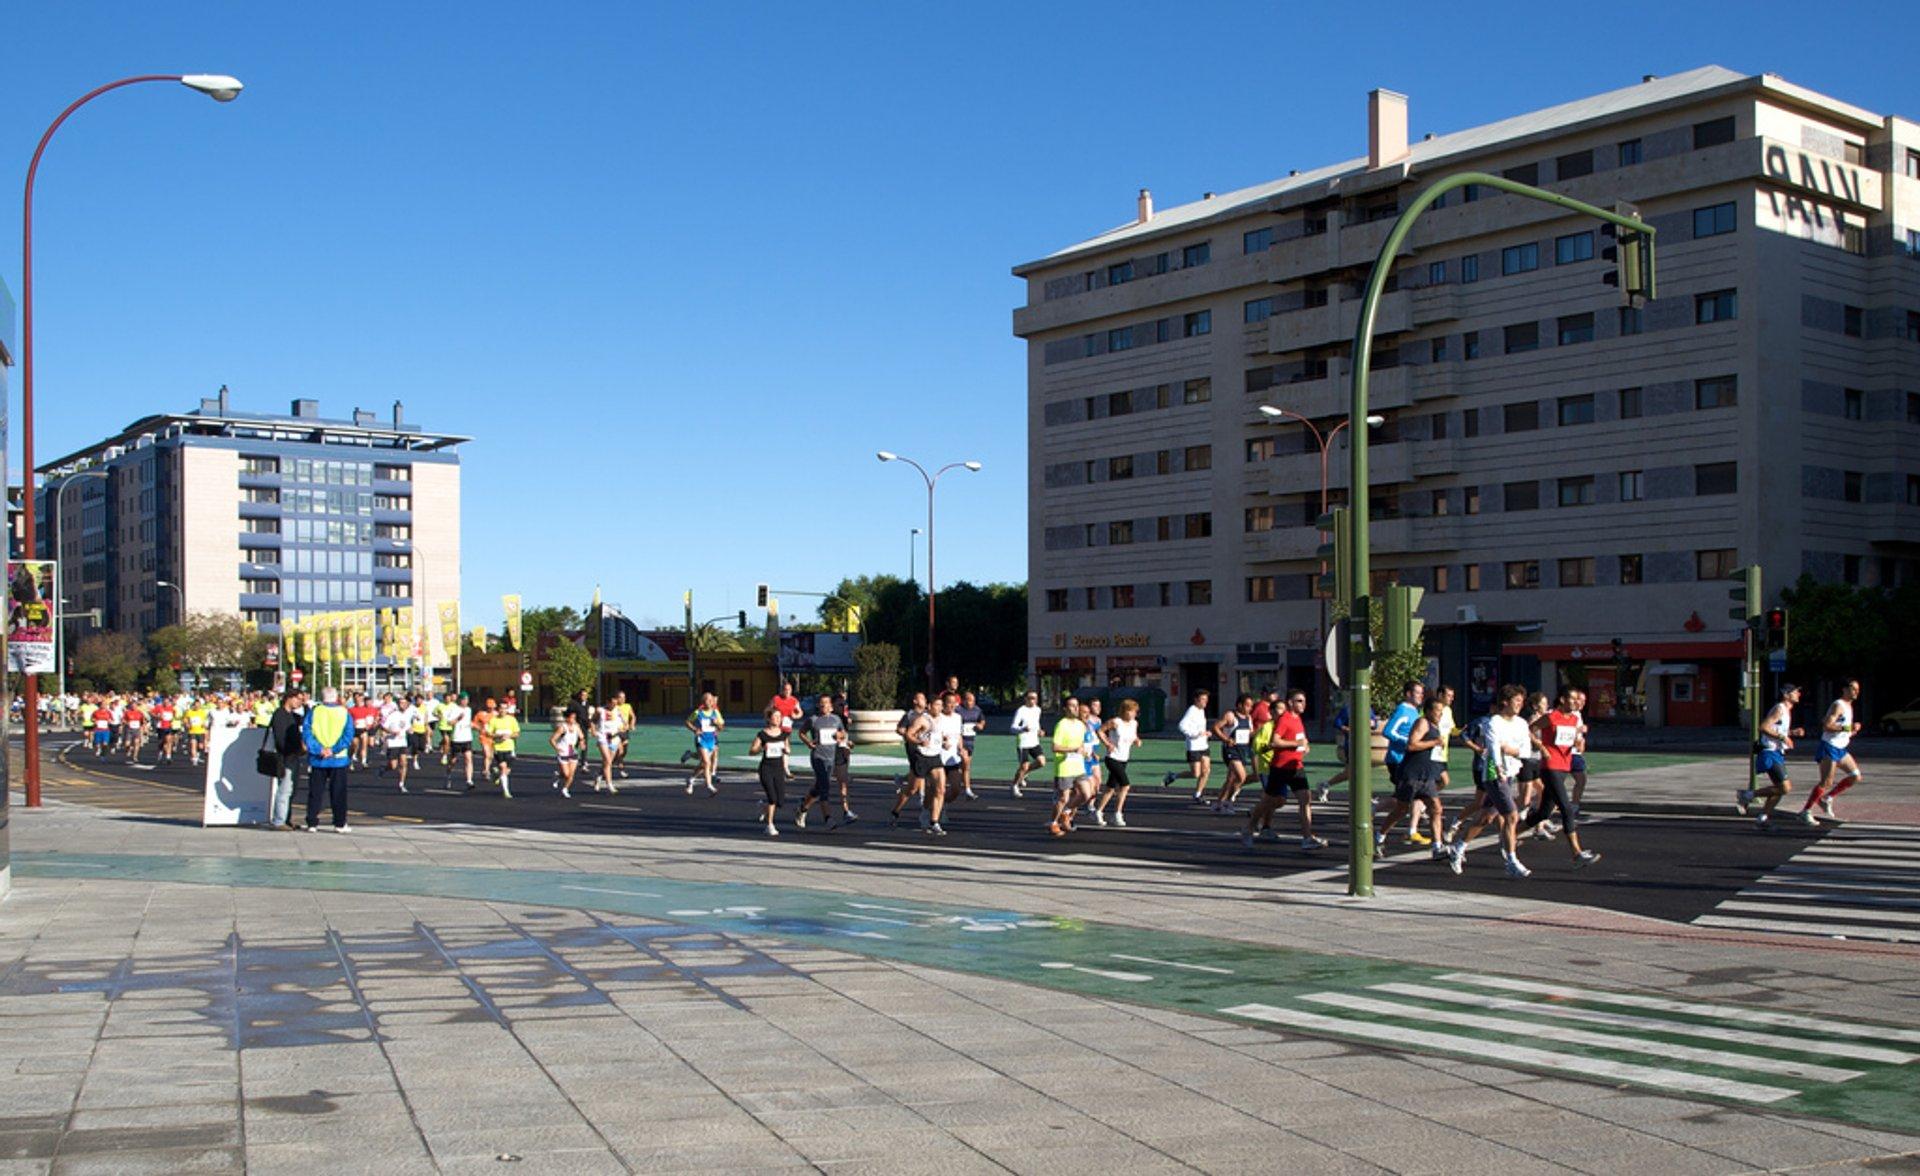 Seville Marathon (Zurich Maraton de Sevilla) in Seville - Best Season 2019